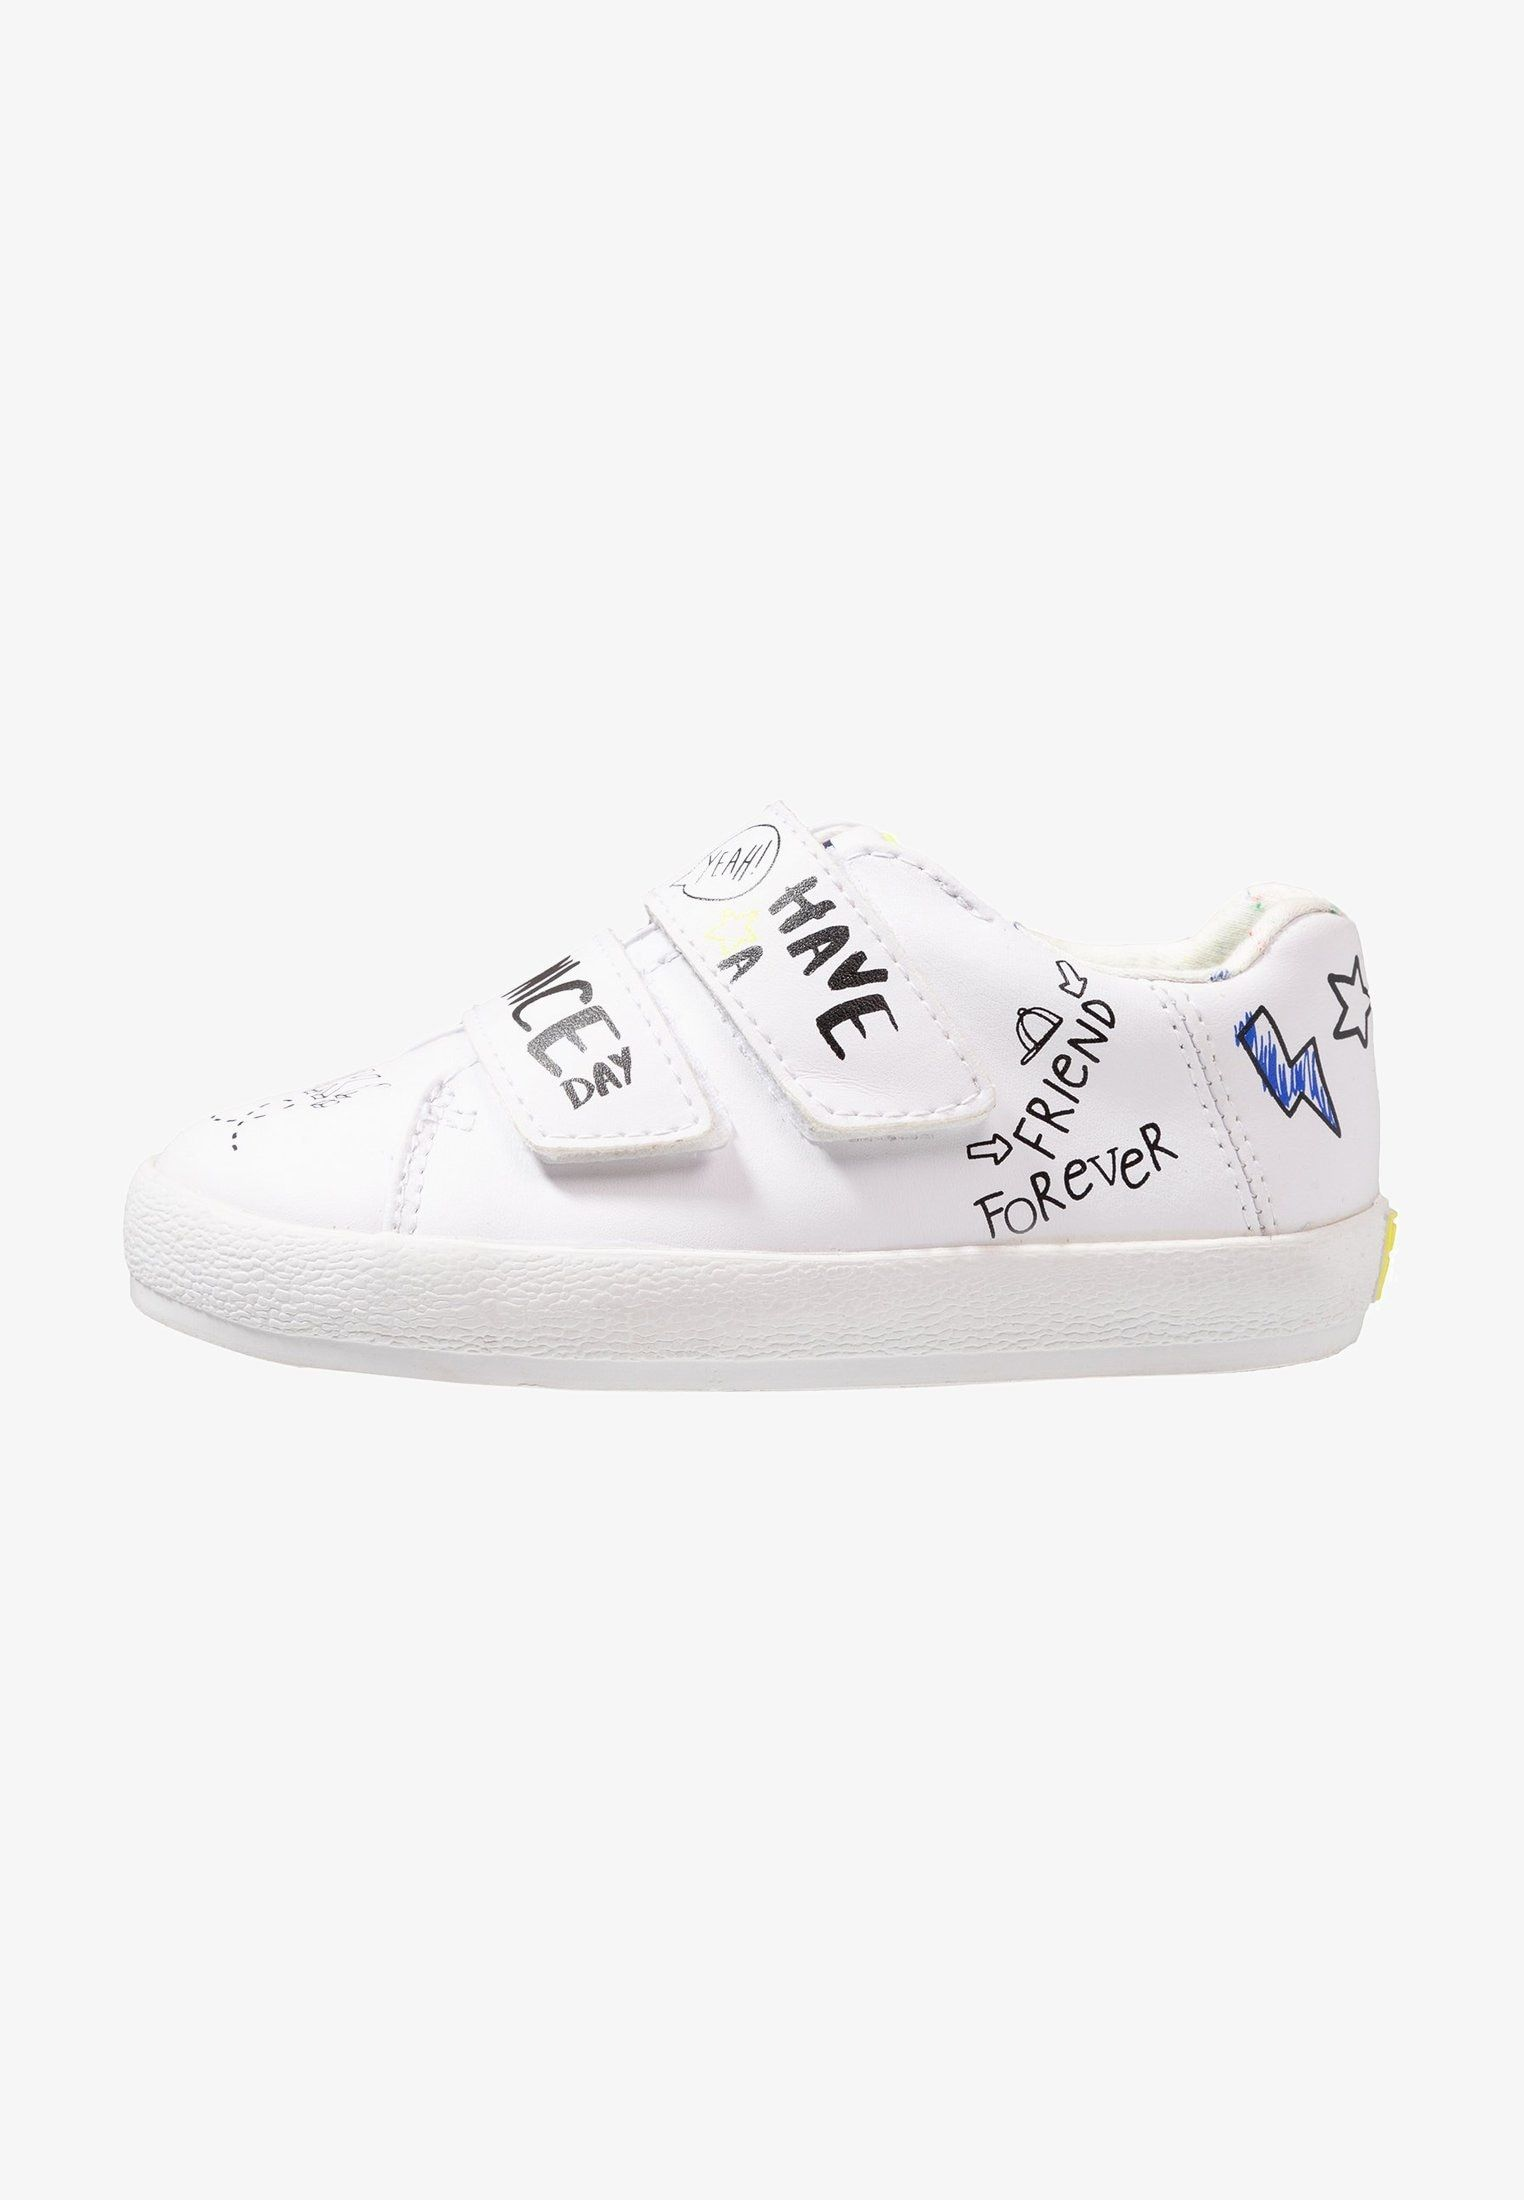 Gioseppo Benevento Zapatillas Blanco Zalando Es Sneakers Boys Shoes Shoes